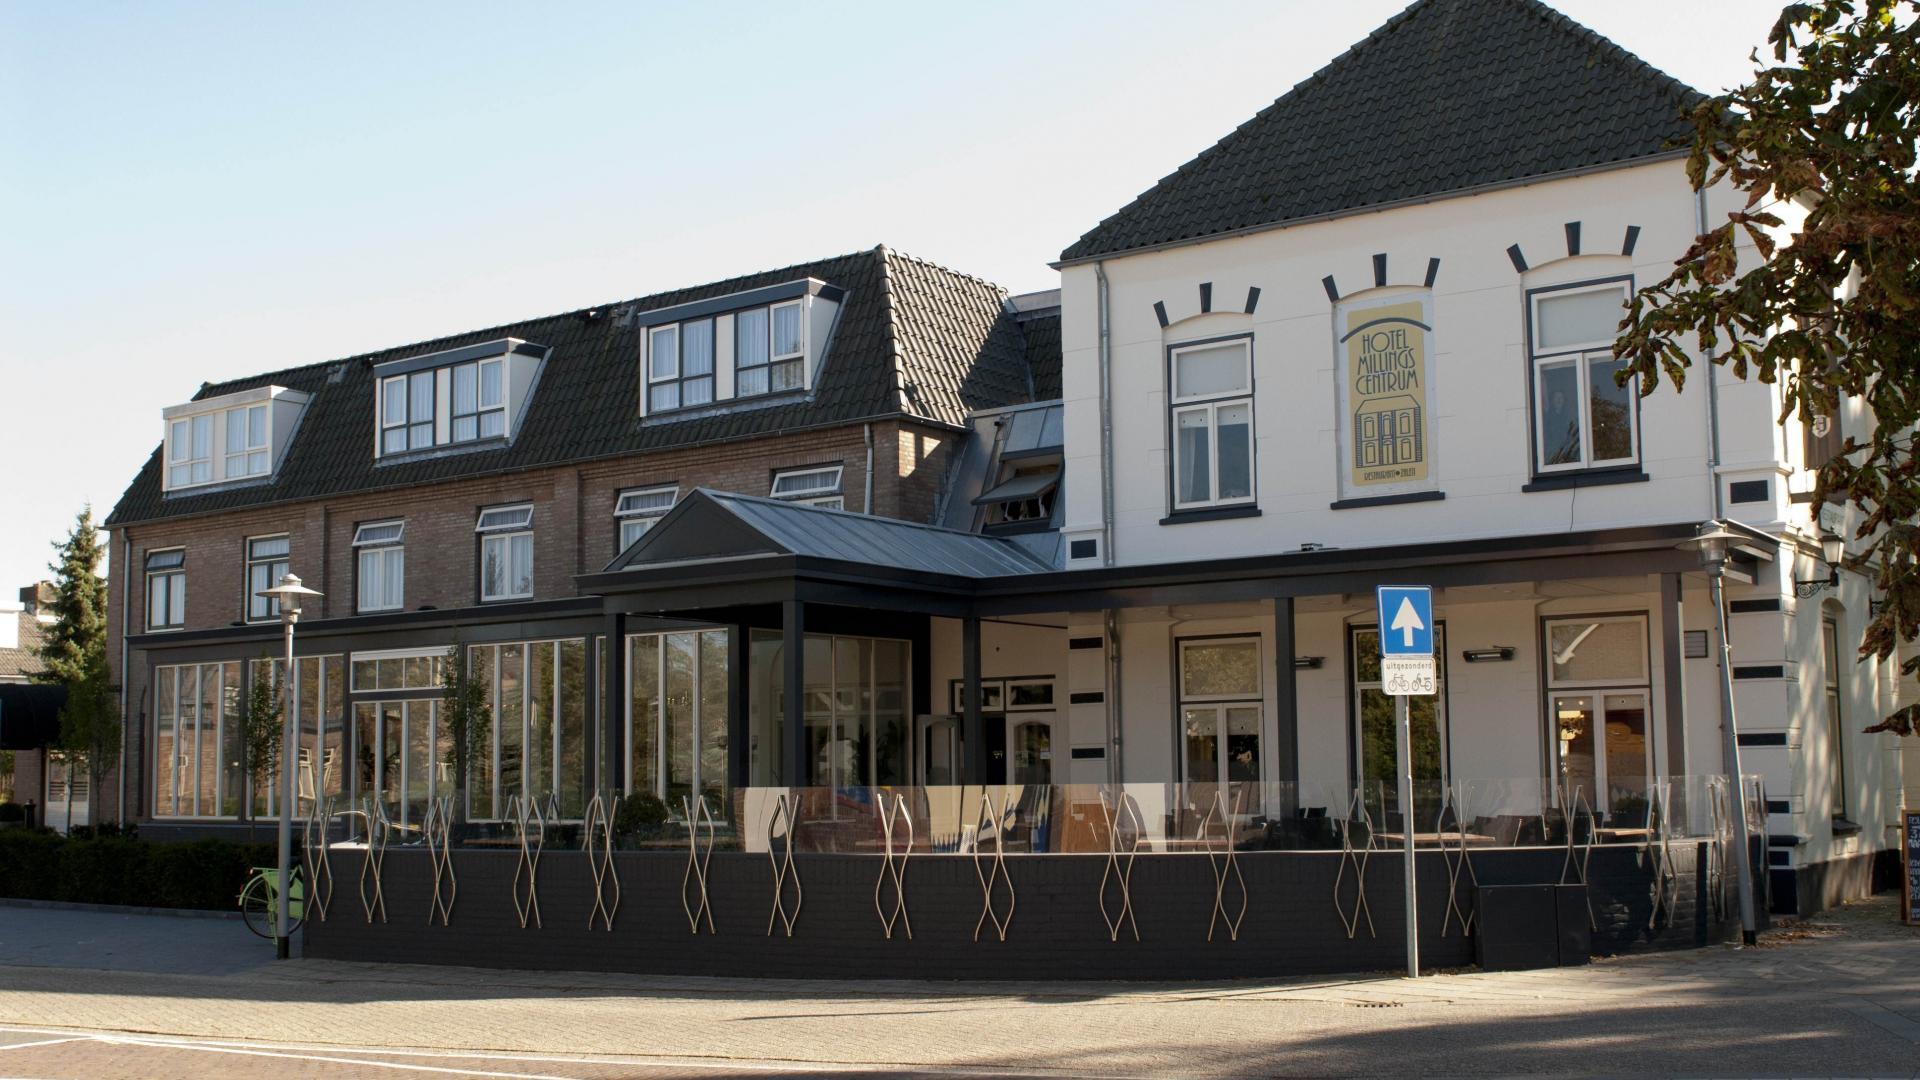 4 dagen spotgoedkoop in <b>Millingen aan de Rijn</b> nabij <b>Nijmegen</b> en <b